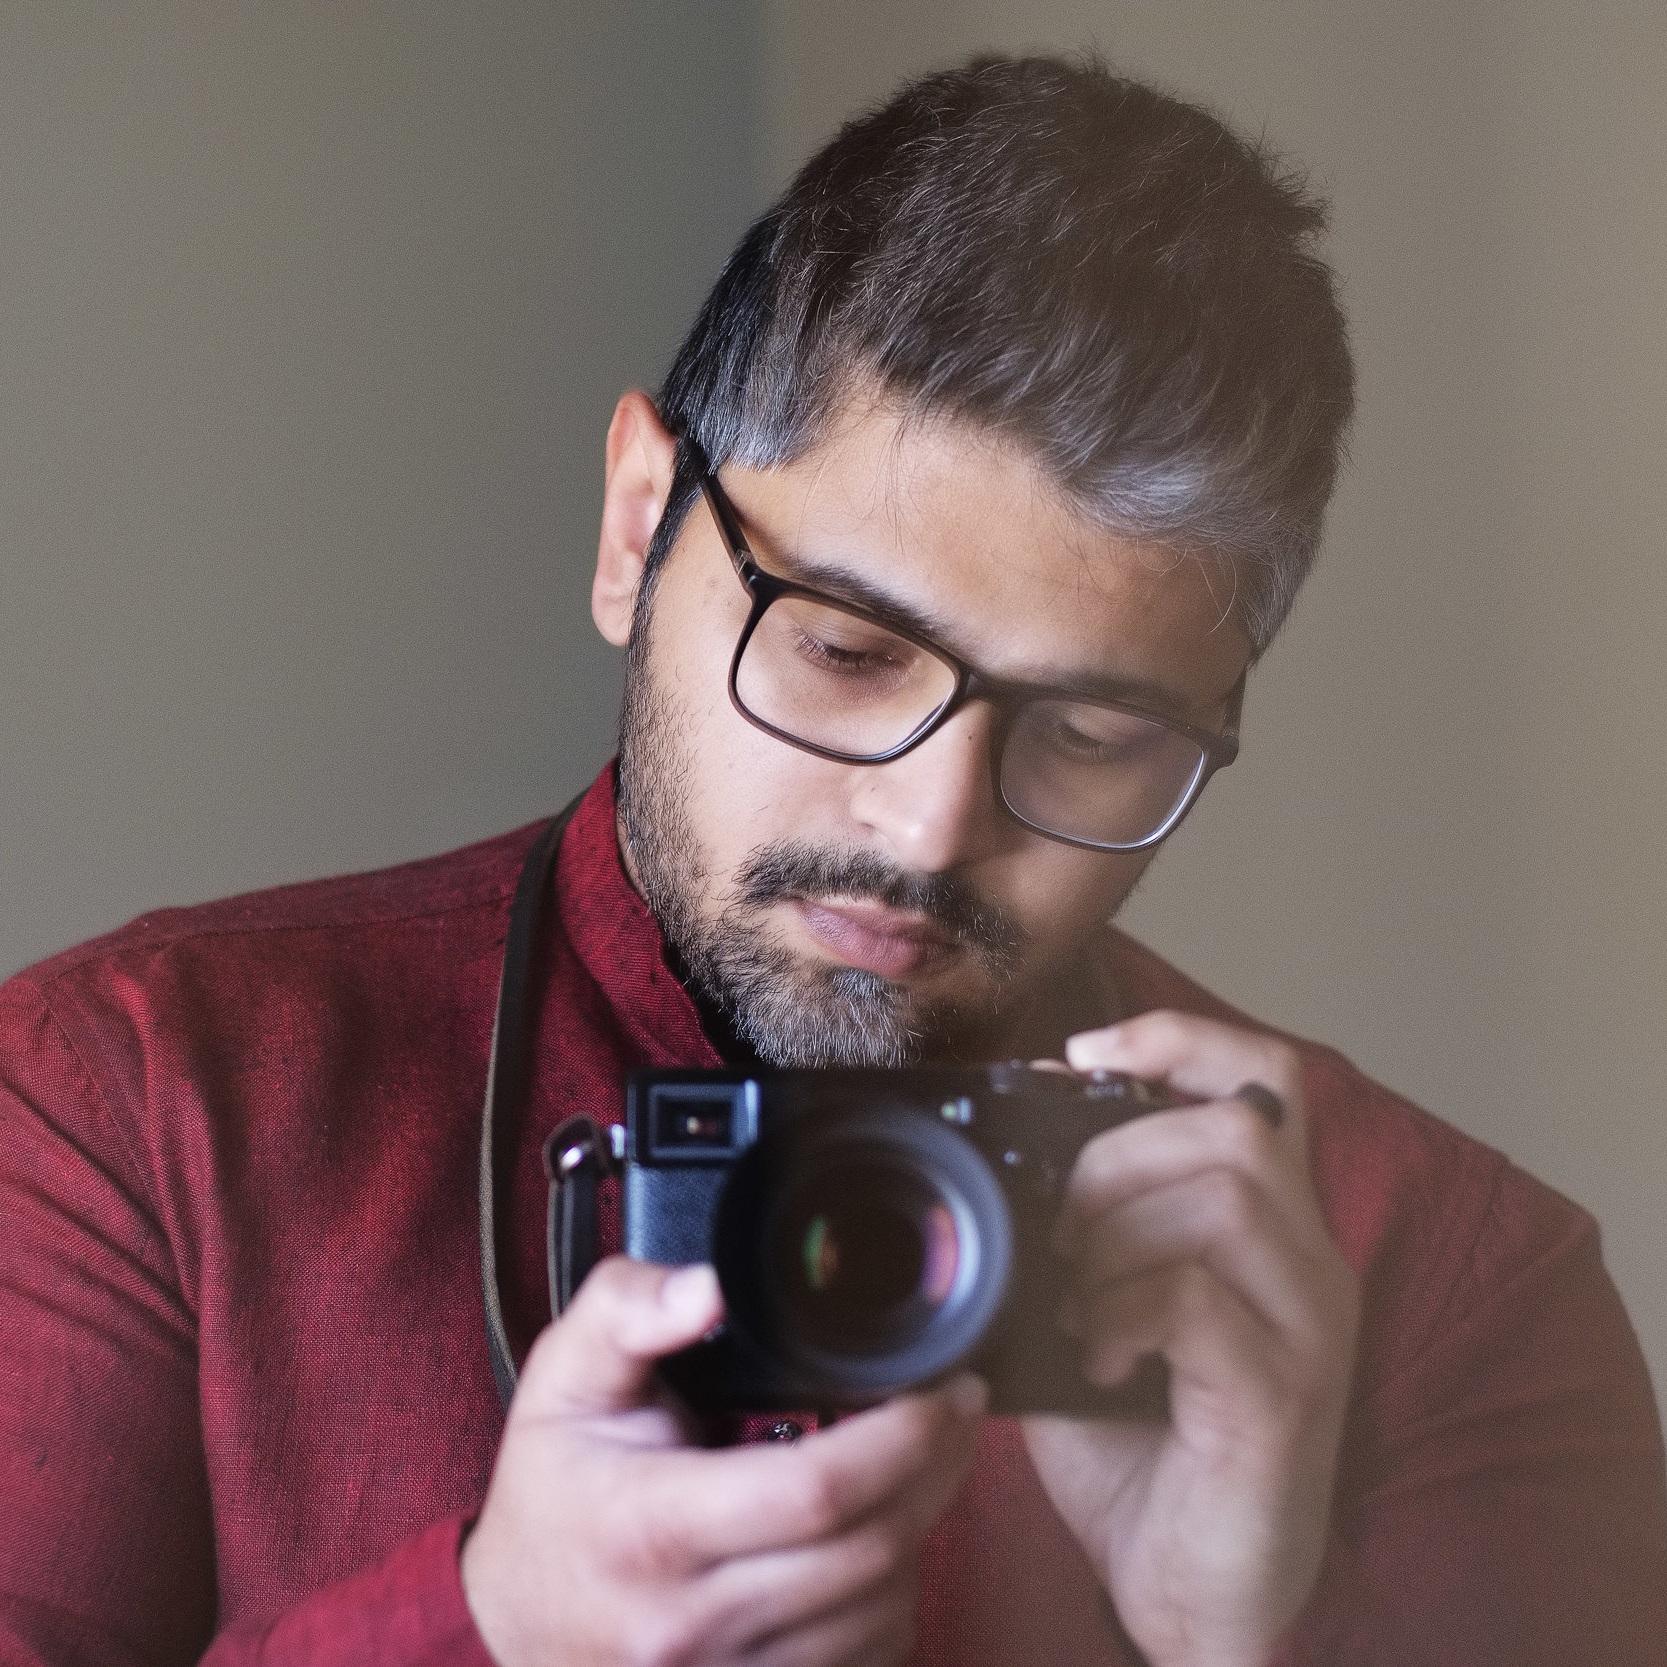 kuwait-city-photographers-john.jpg